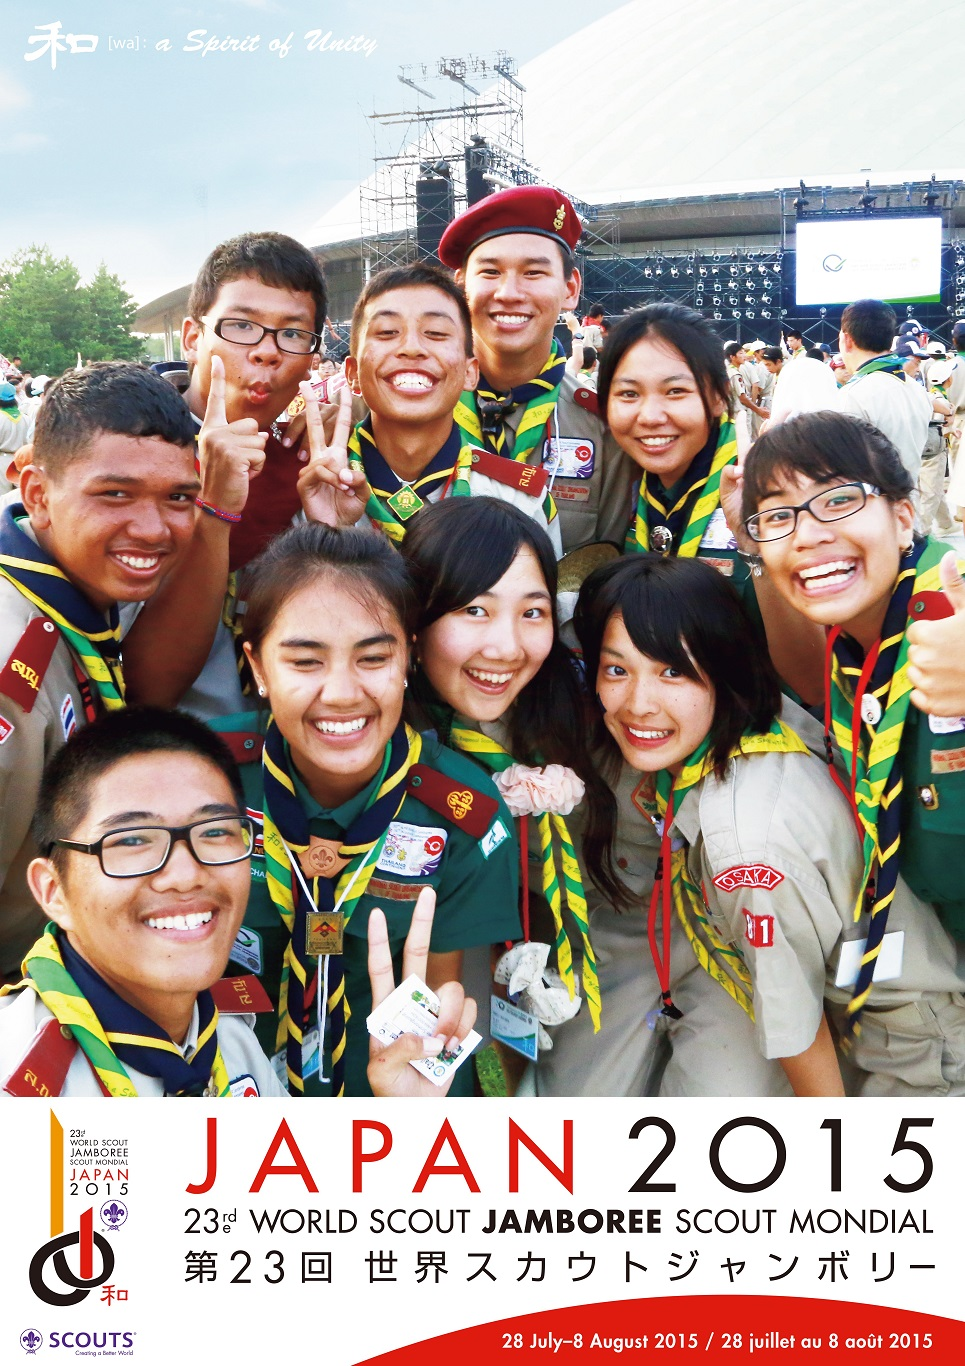 resize-poster-jap-jam-2015